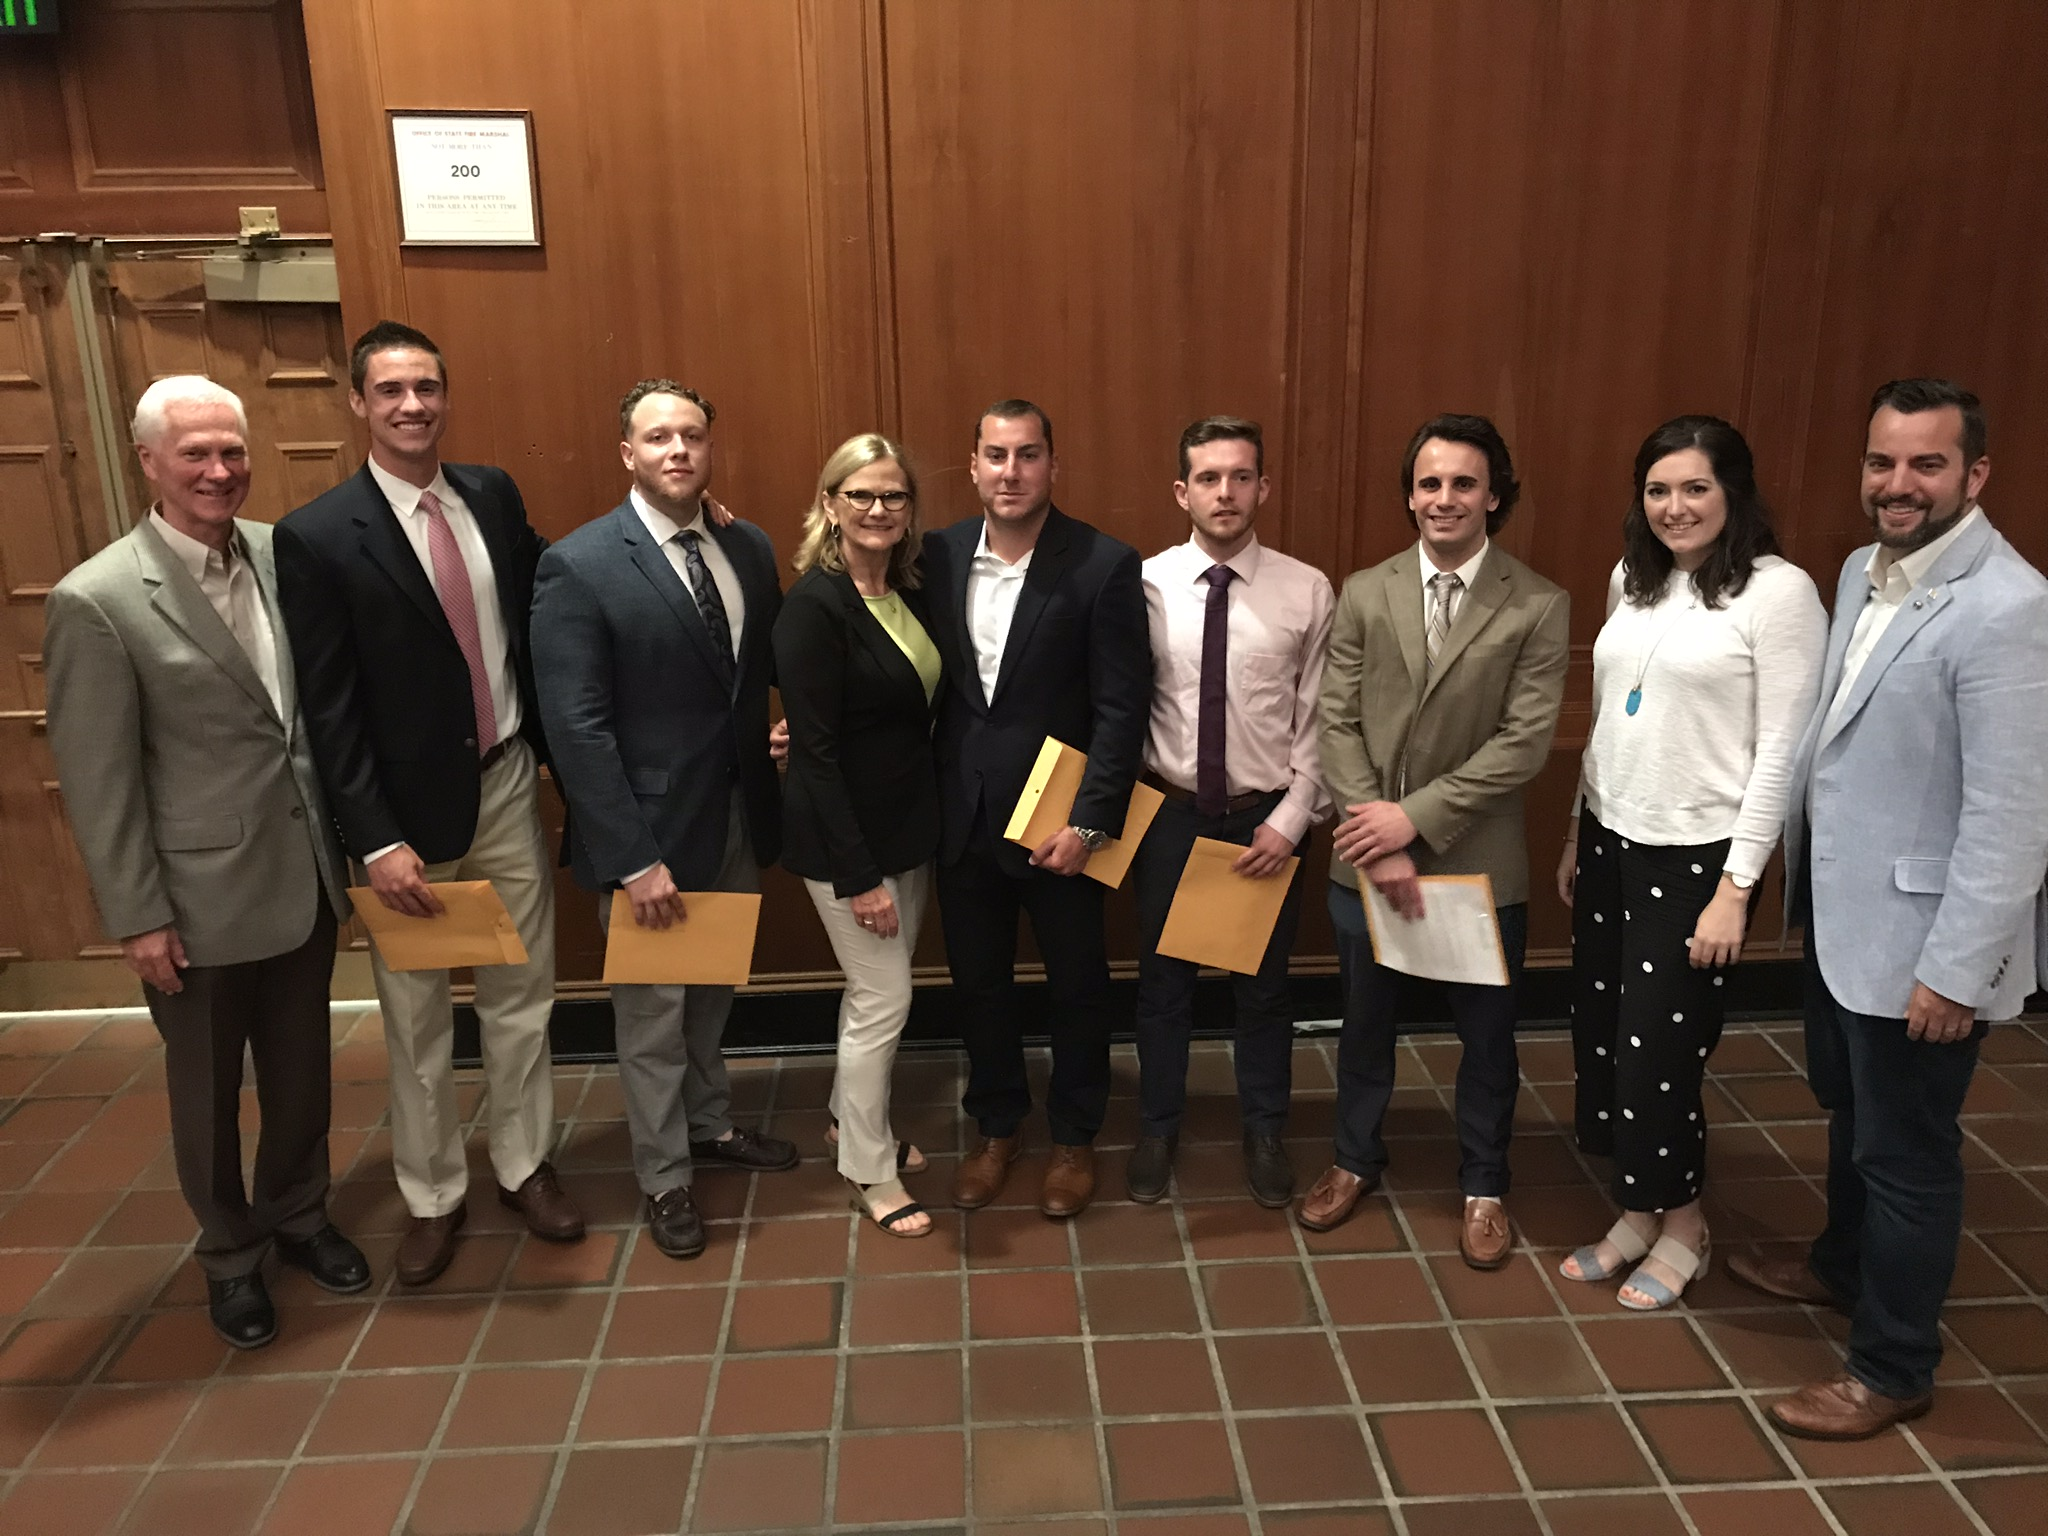 2019 ZGK Award Recipients with ZGK Board Members